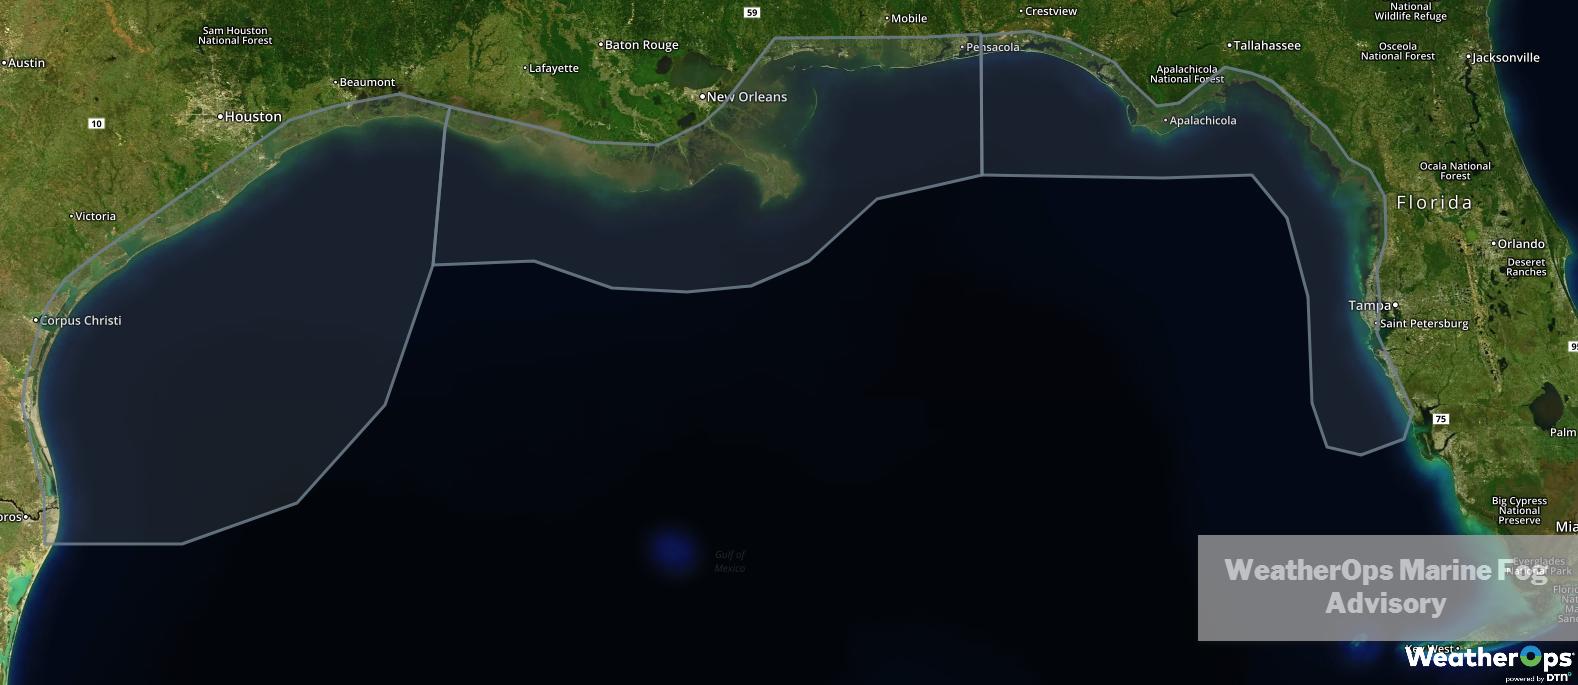 WeatherOps Marine Fog Advisory 2/21/19